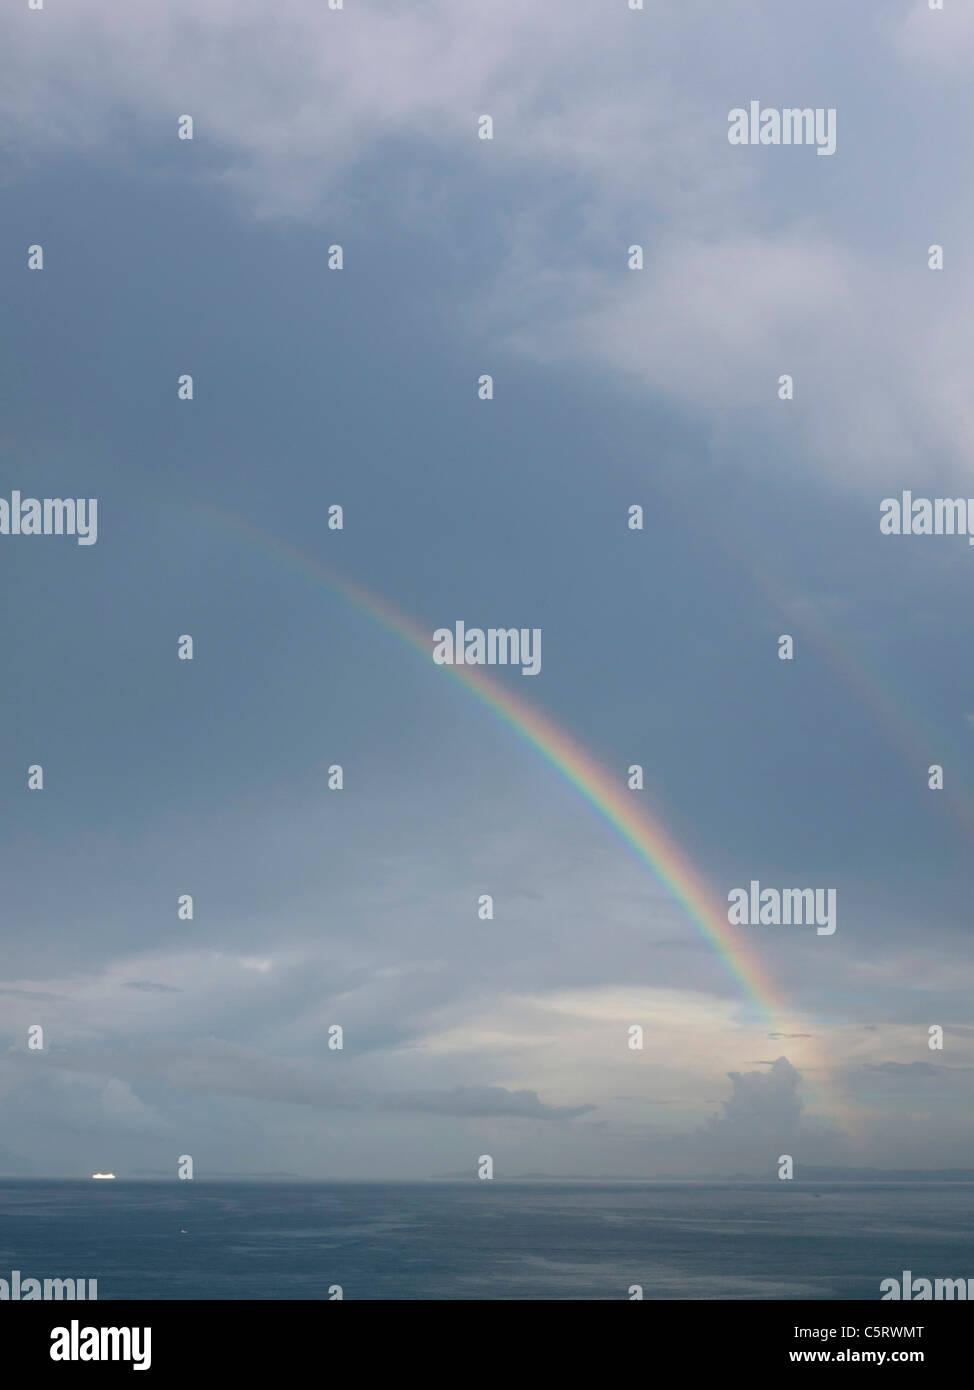 Süditalien, Amalfi-Küste, Piano di Sorrento, Blick auf schönen Regenbogen im Meer in der Morgendämmerung Stockbild